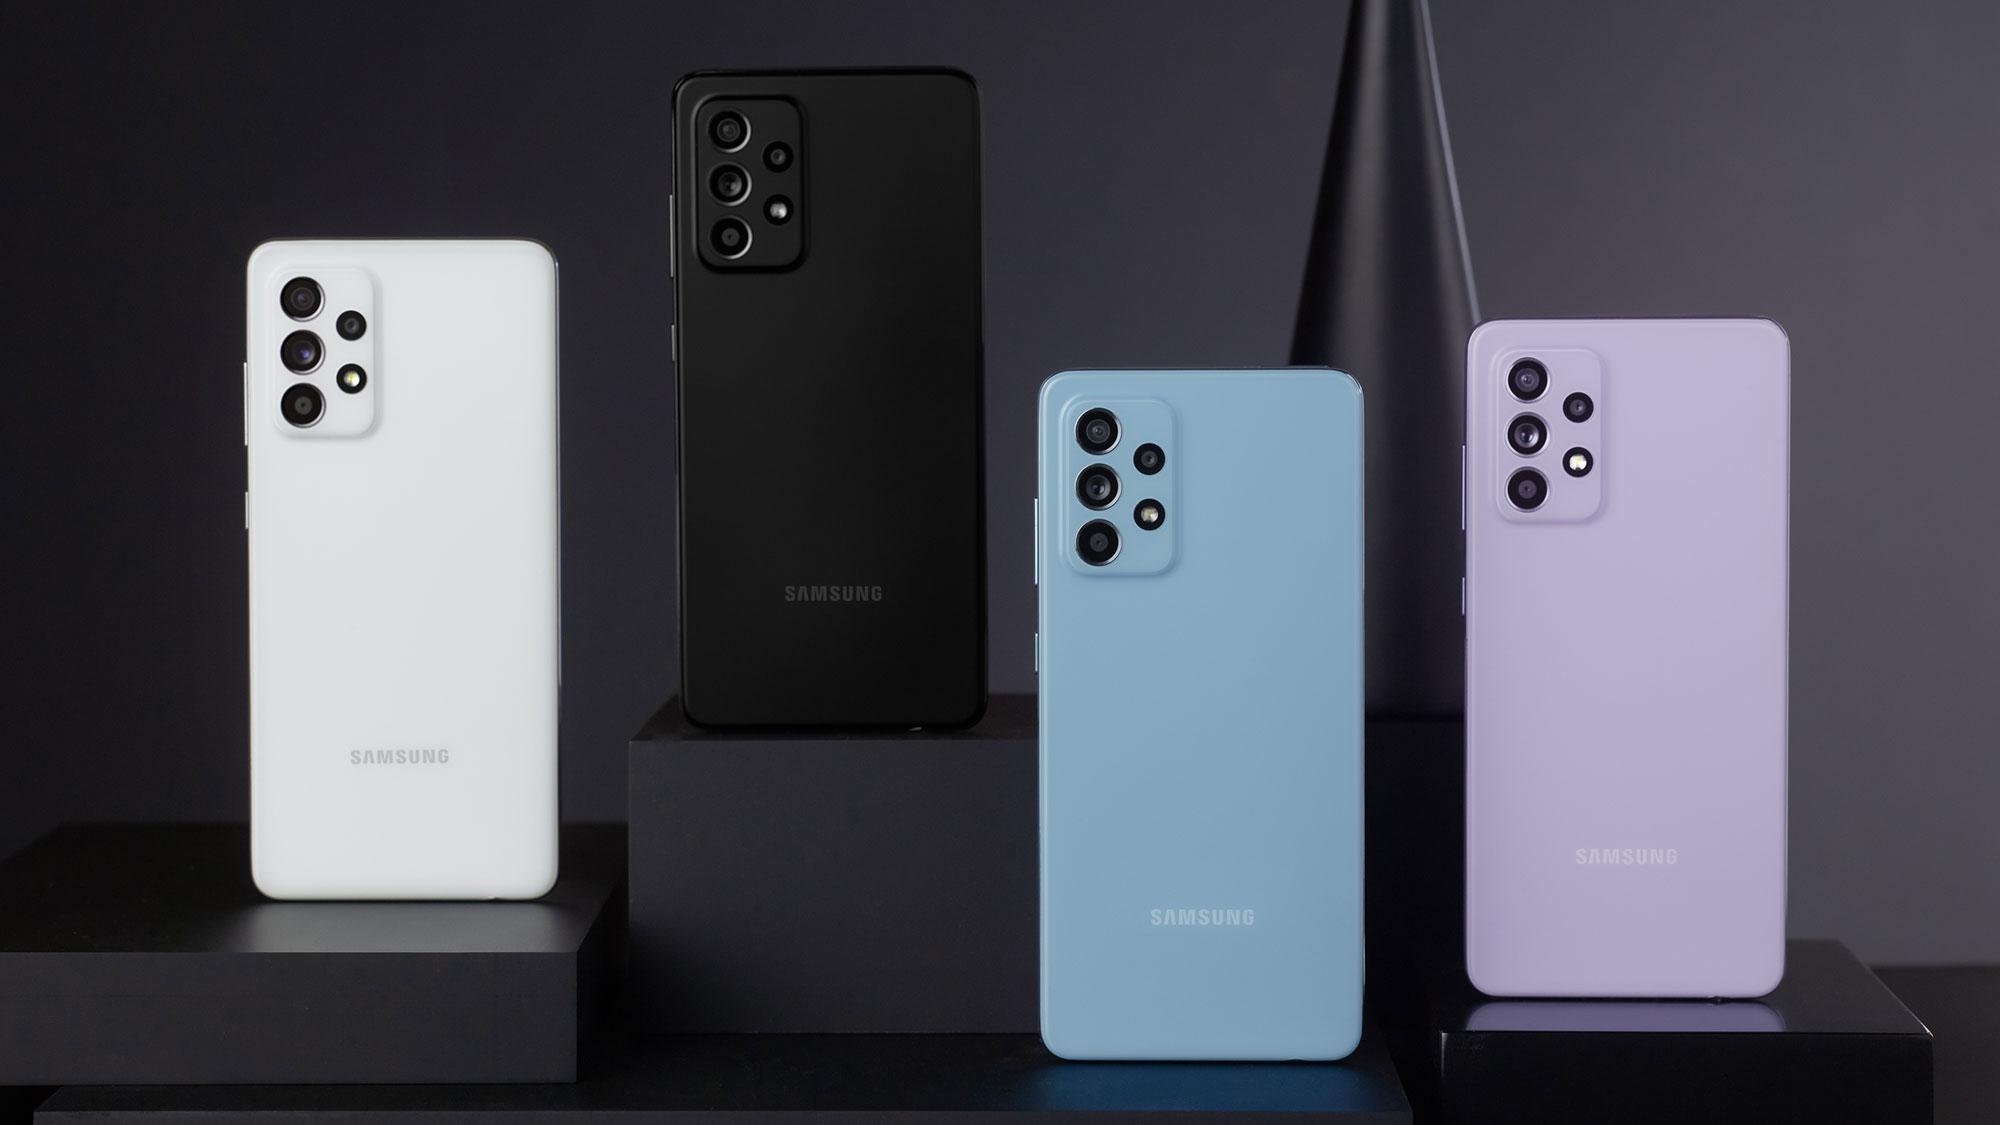 Samsung Galaxy A52, A52 5G and A72 Smartphones